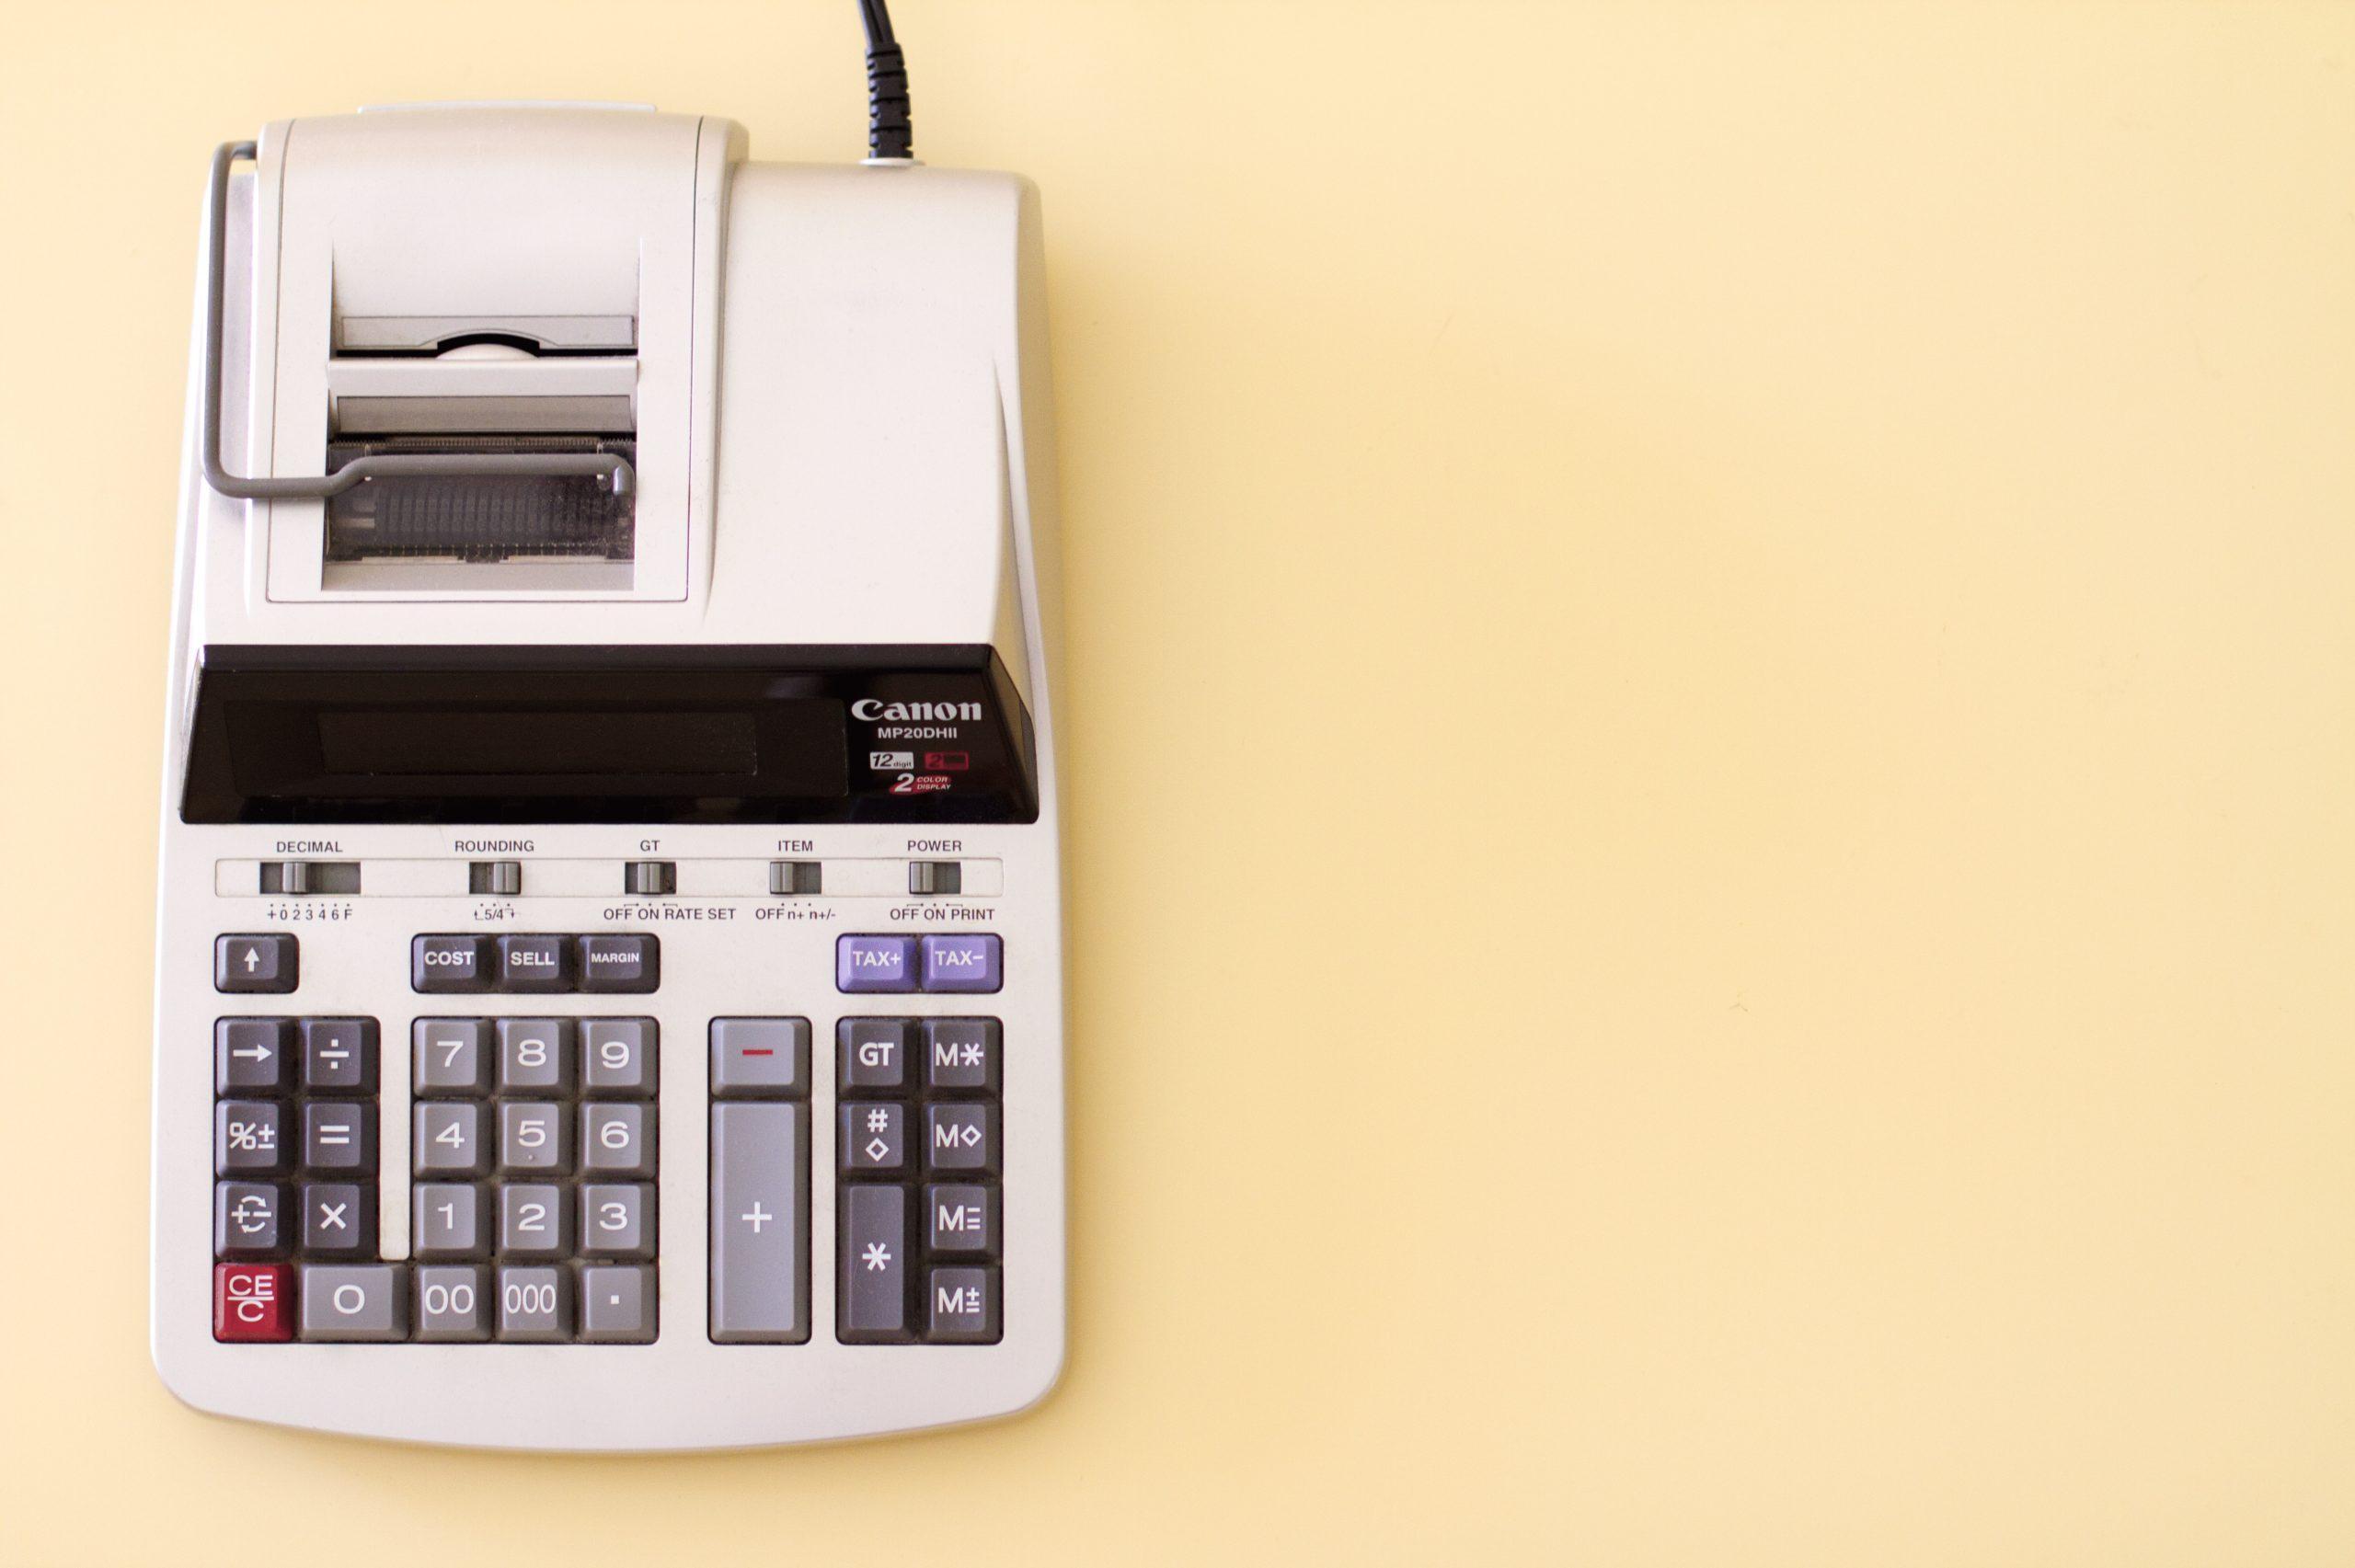 Remortgaging Calculator